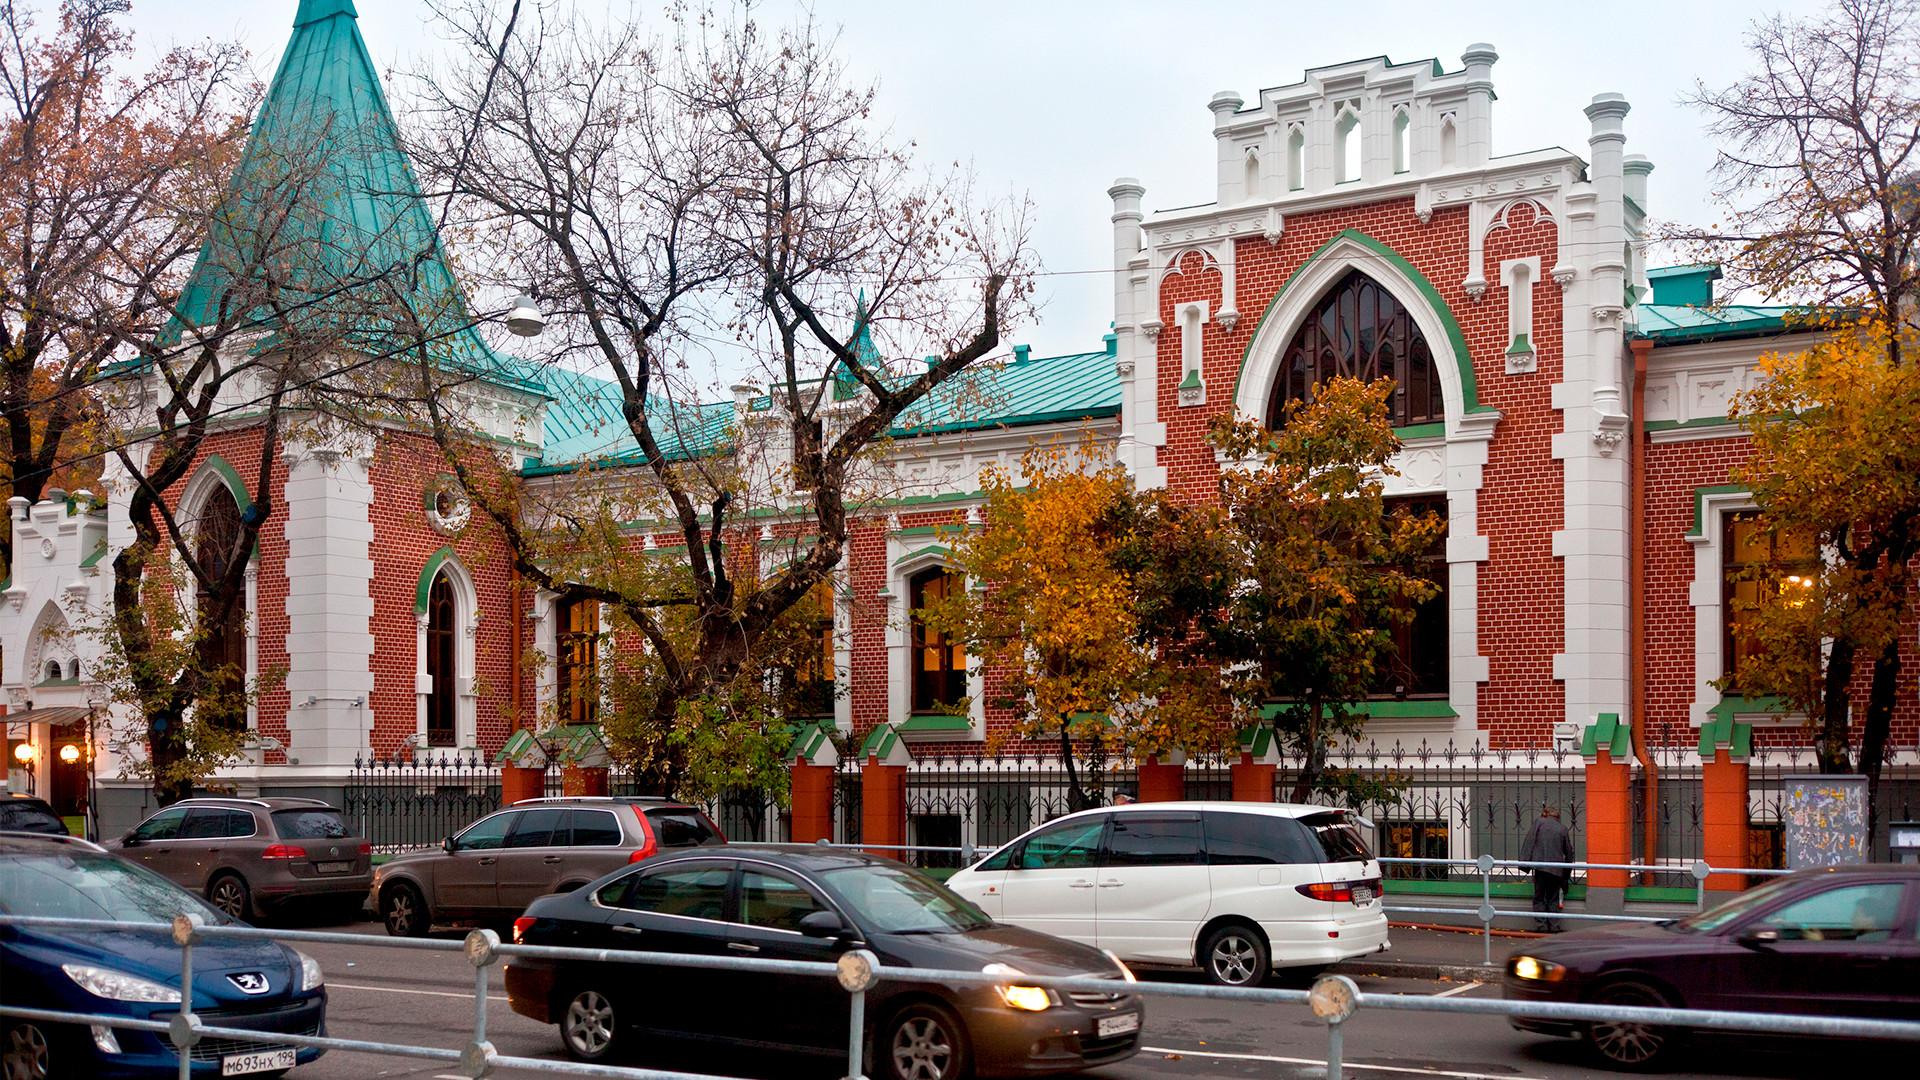 Театральный музей Бахрушина.